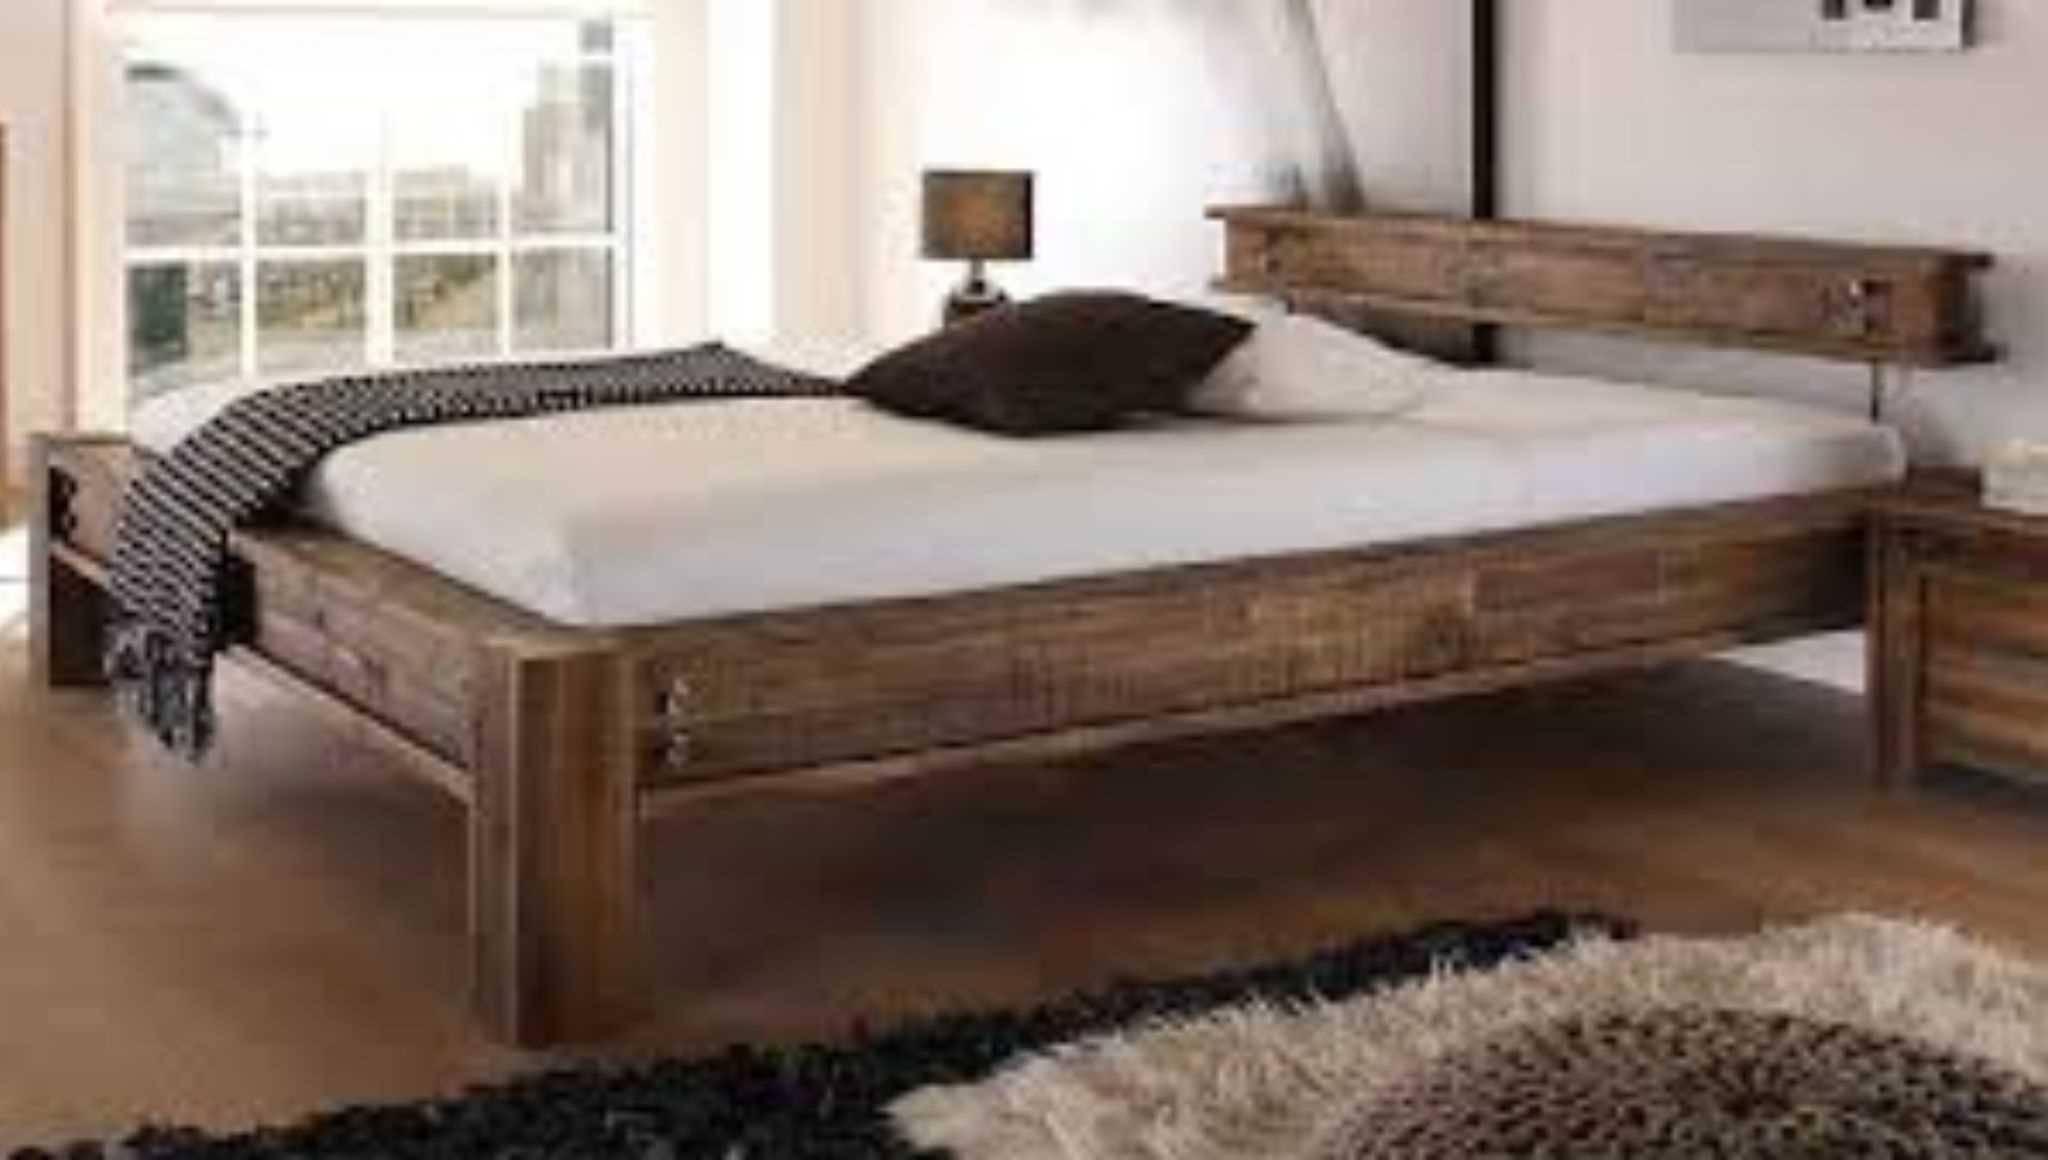 lit complet 160 200 avec matelas au choix suisse expo komplettes schlafzimmer. Black Bedroom Furniture Sets. Home Design Ideas